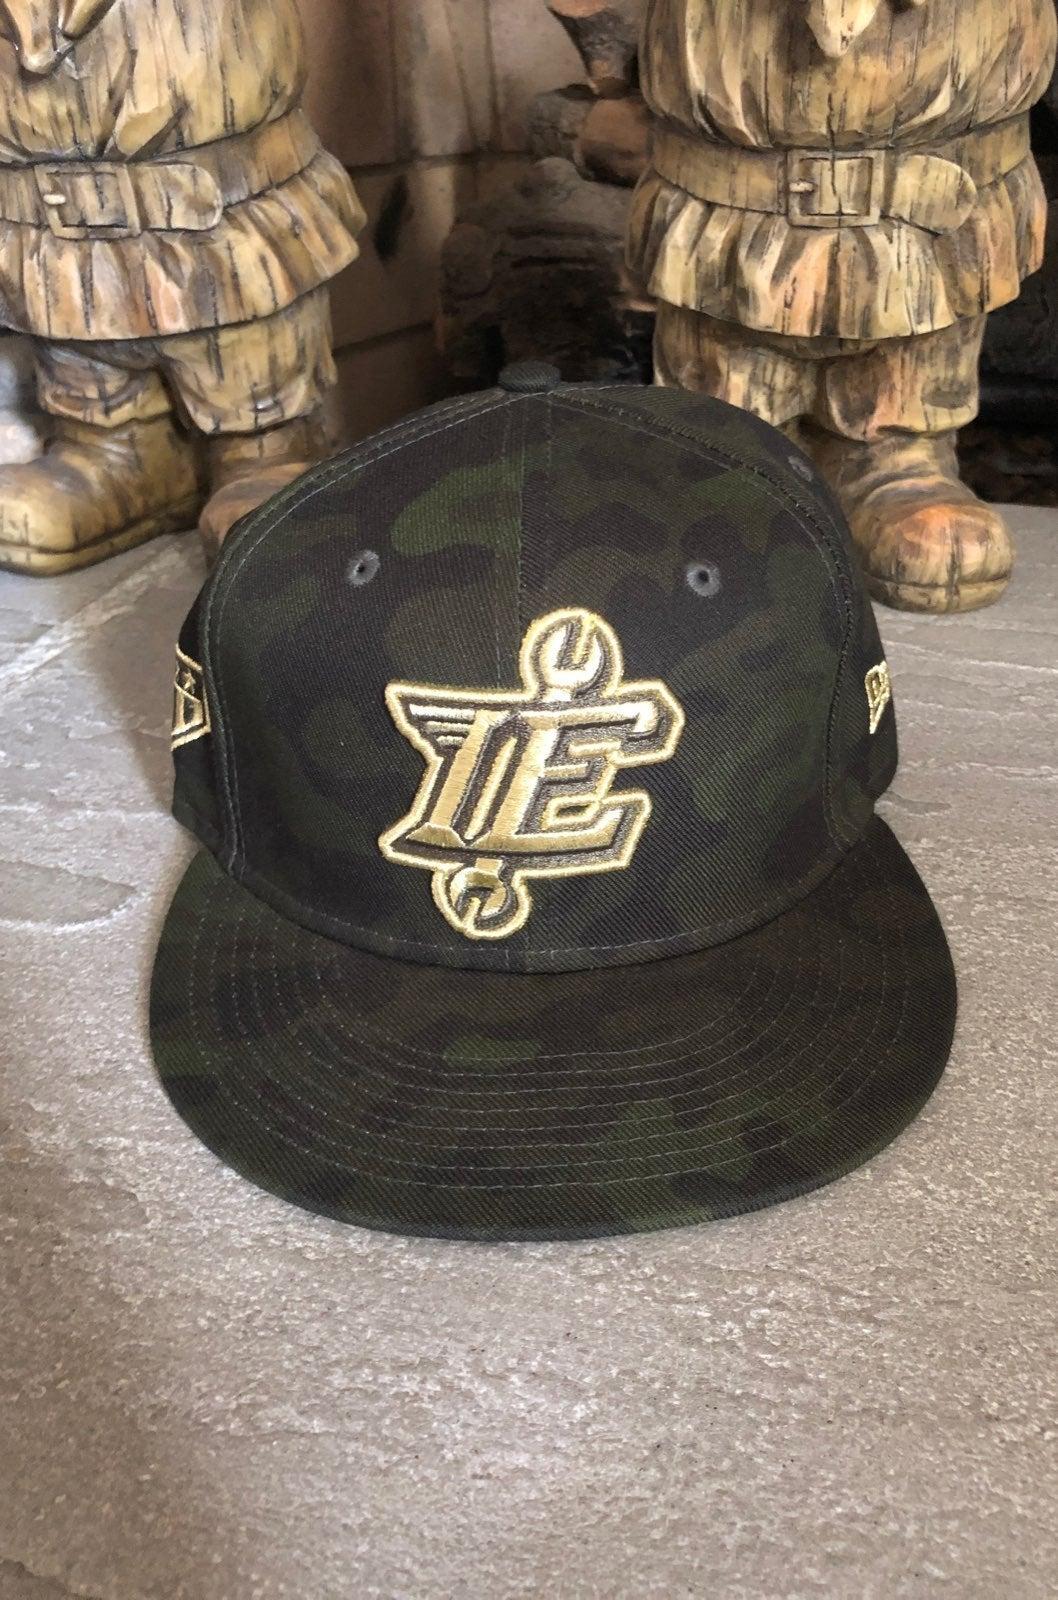 IE 66ers milb camo military new era hat